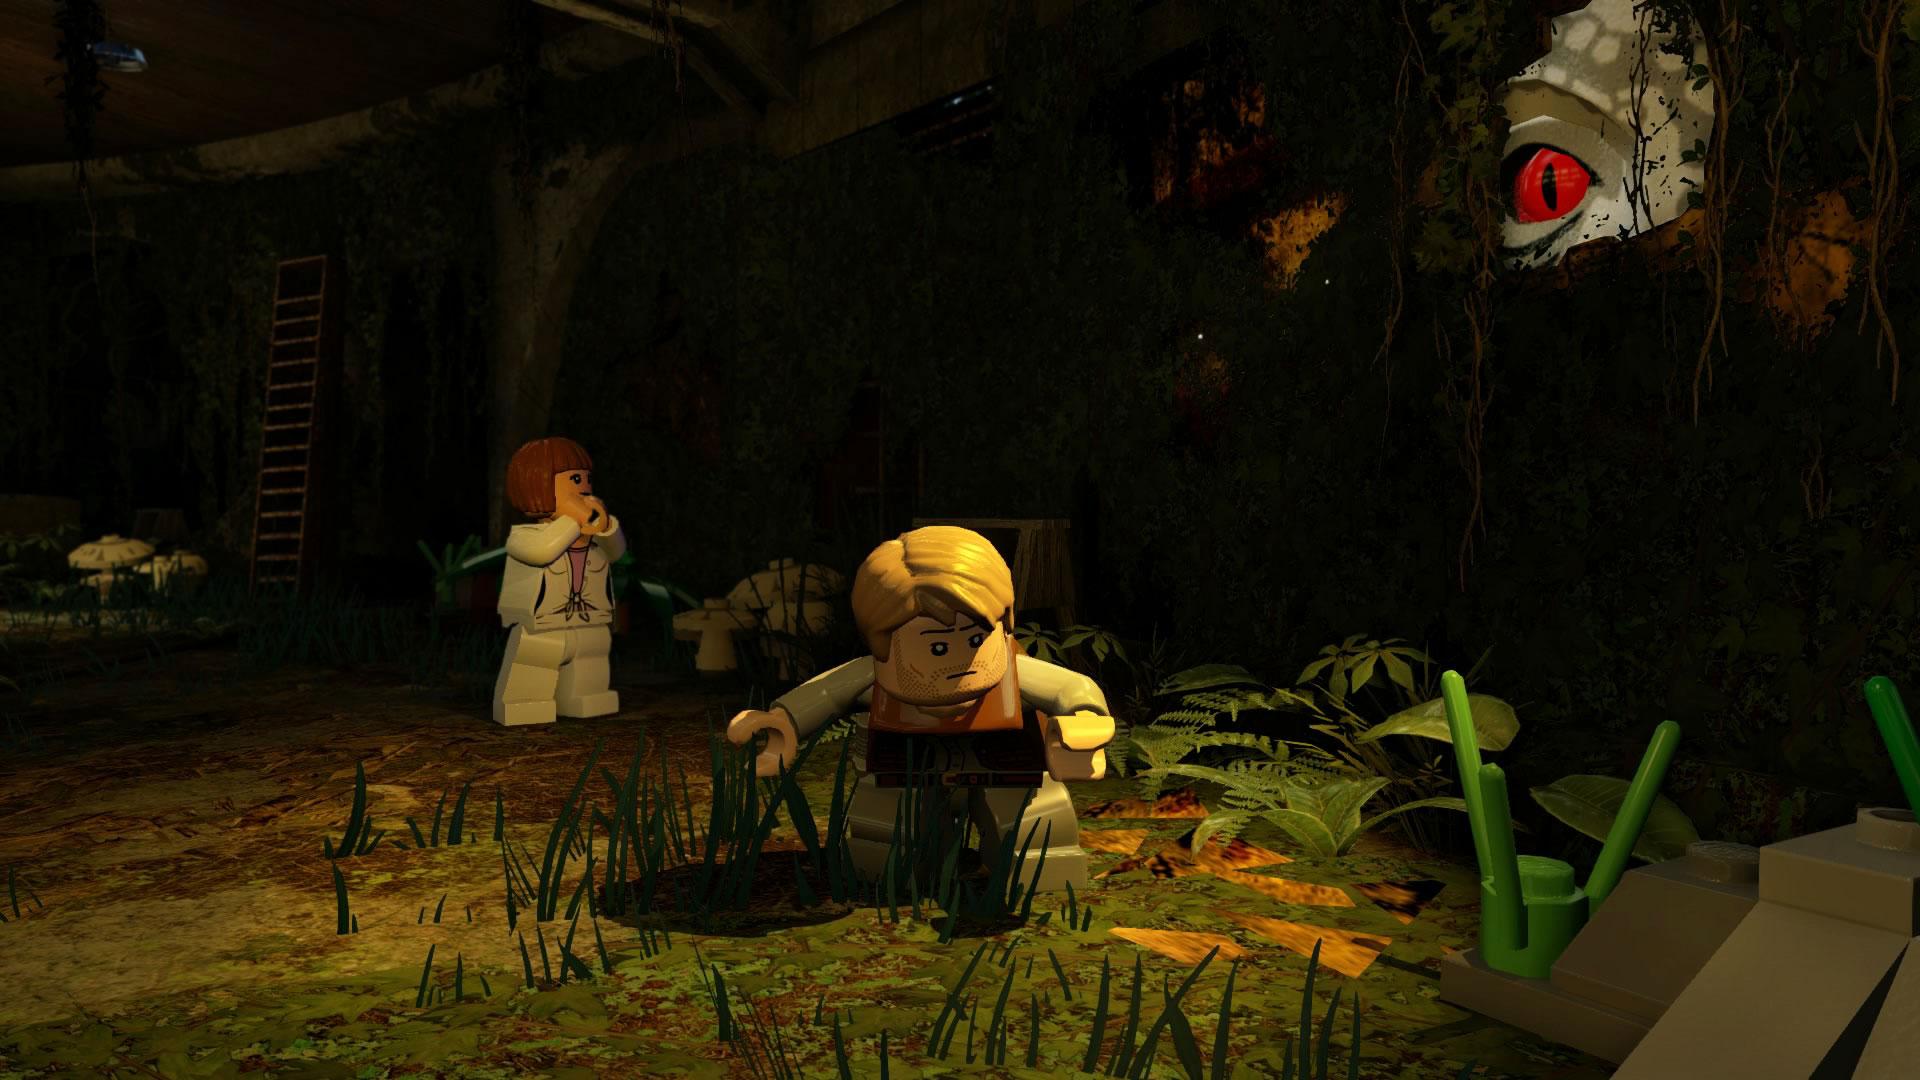 LEGO Jurassic World Screenshot 2